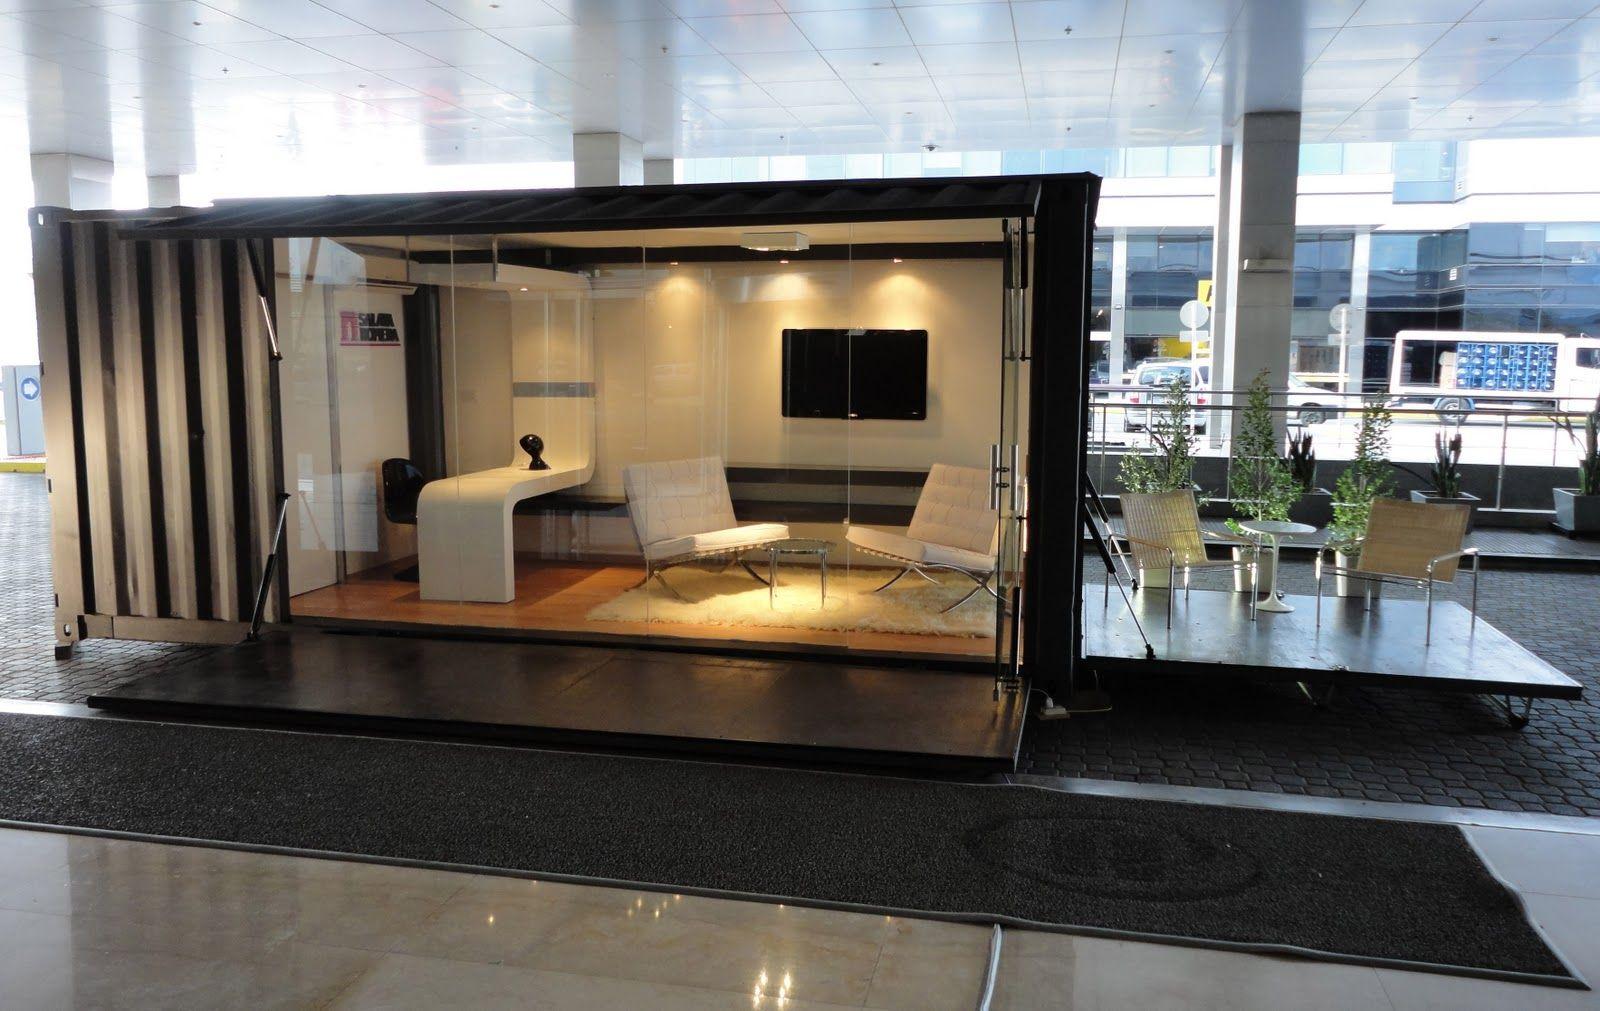 Eco office movil oficina dise ada con un container for Diseno de oficinas con contenedores